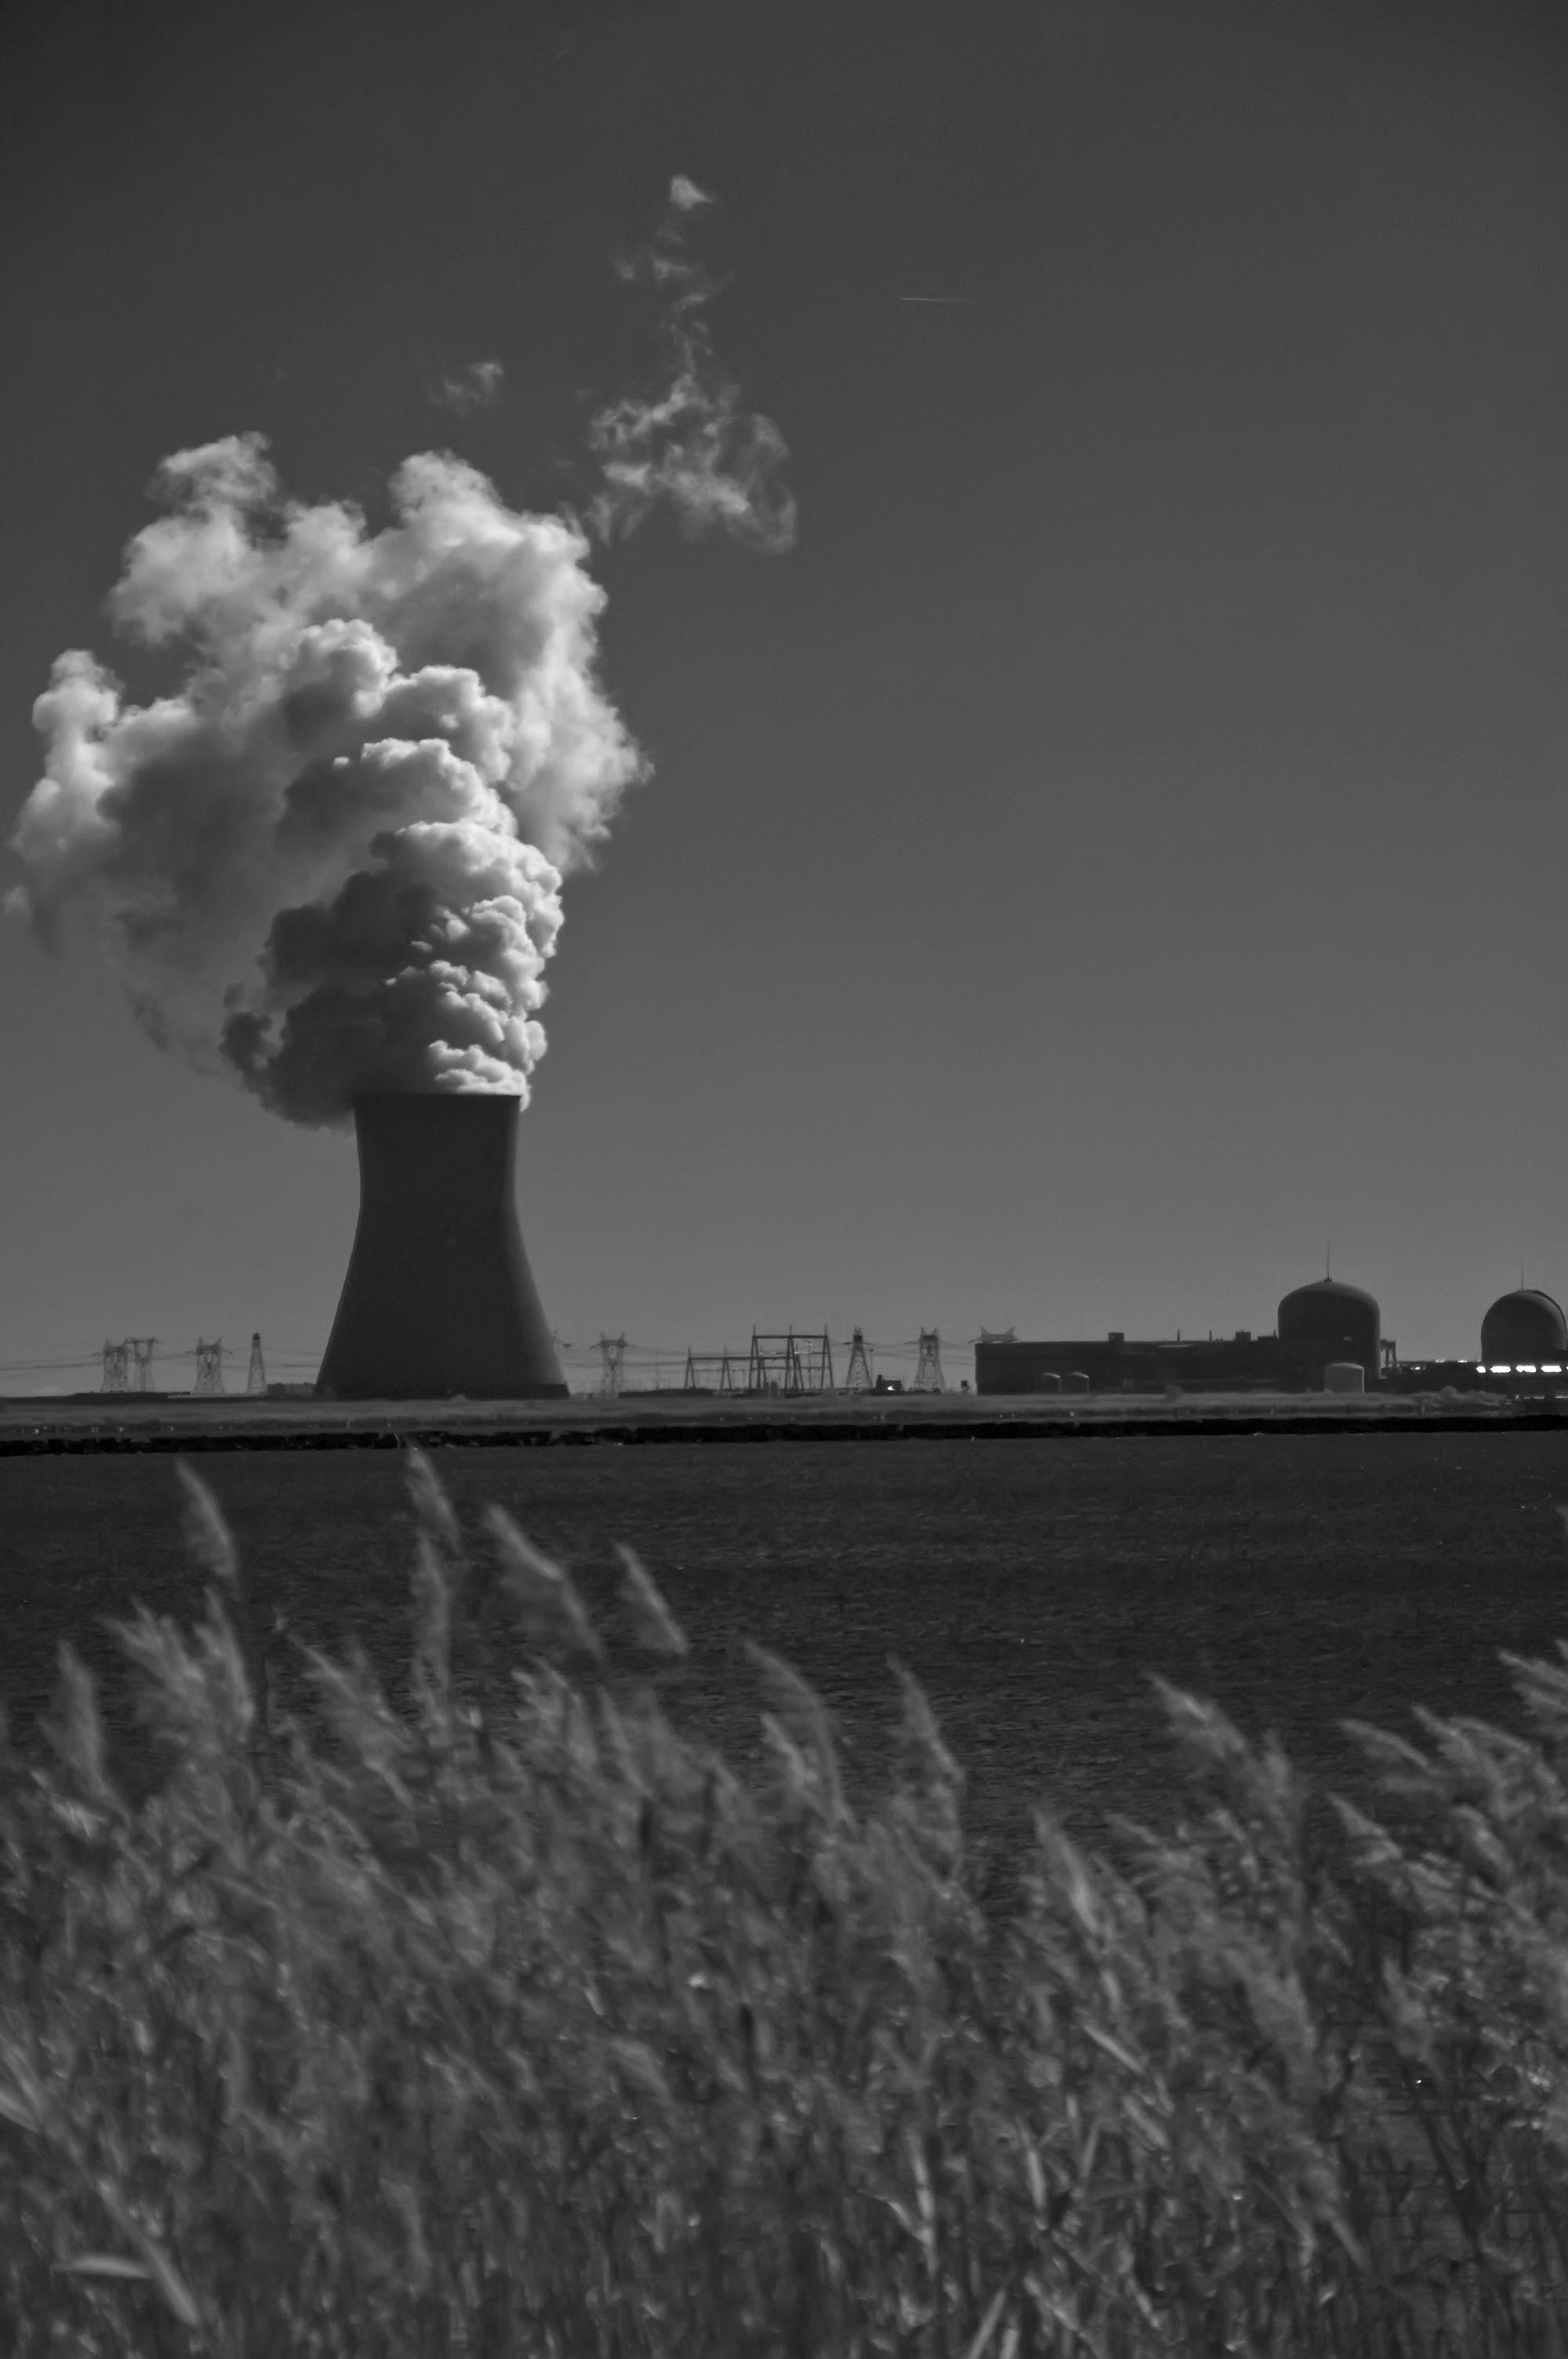 Salem nuke plant